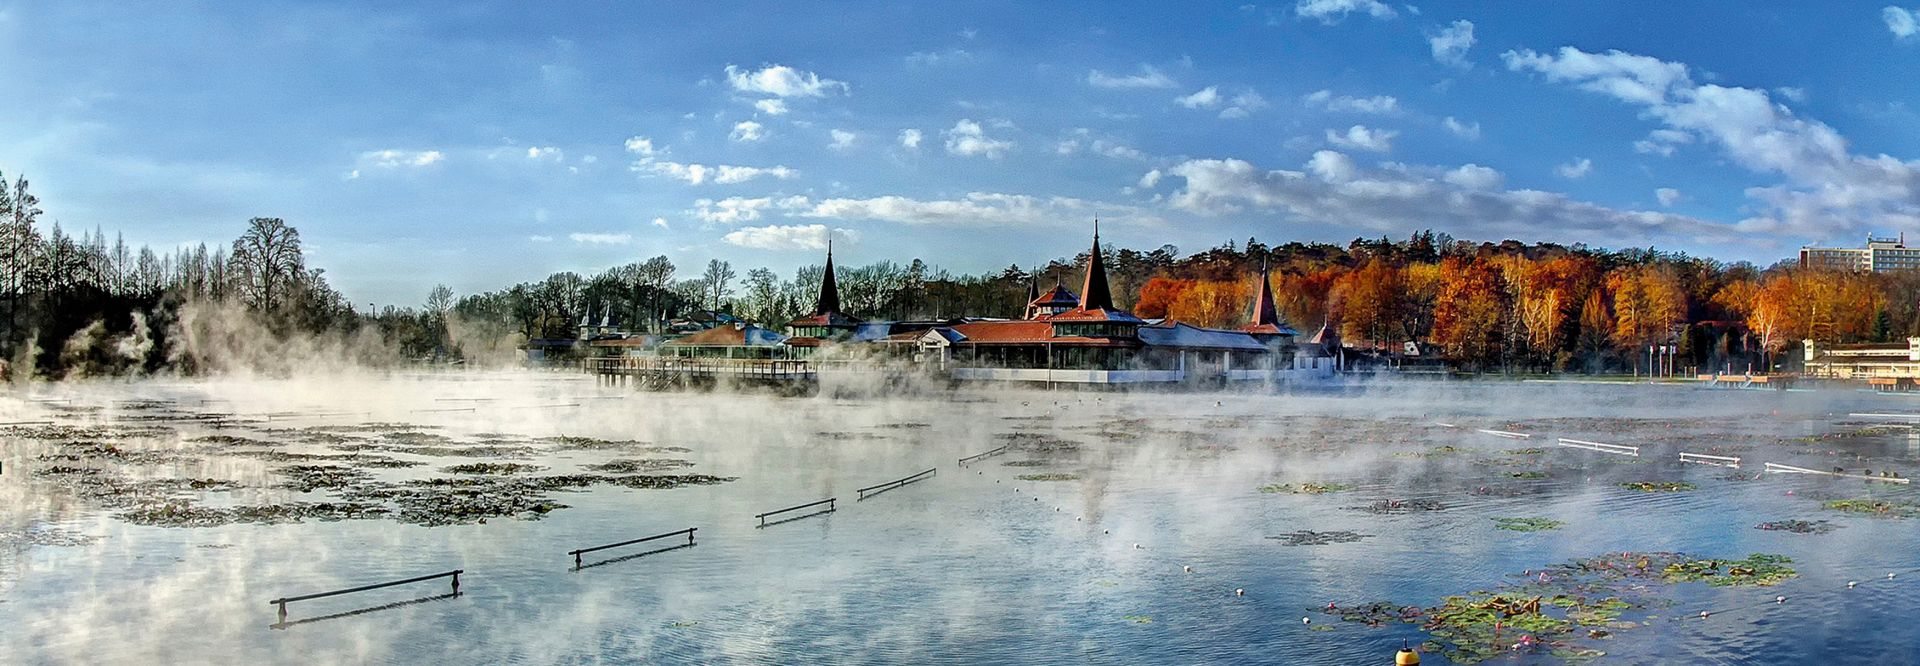 Dampfender Thermalsee im Herbst (Tourinform Hévíz)